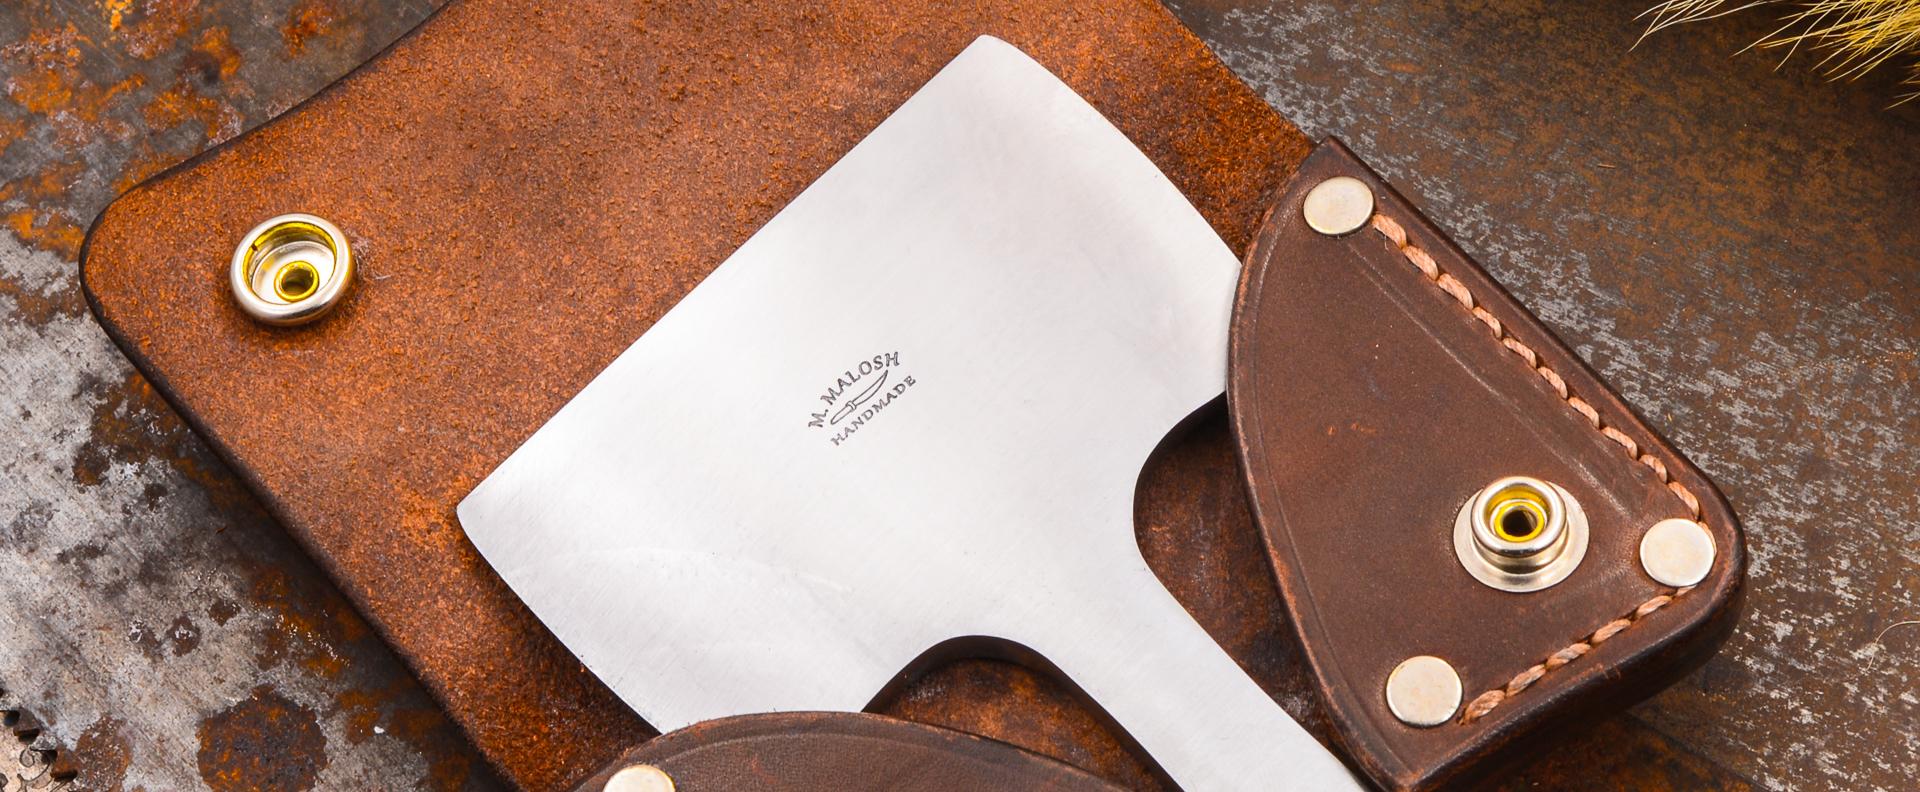 Mike Malosh Custom Handmade Knives